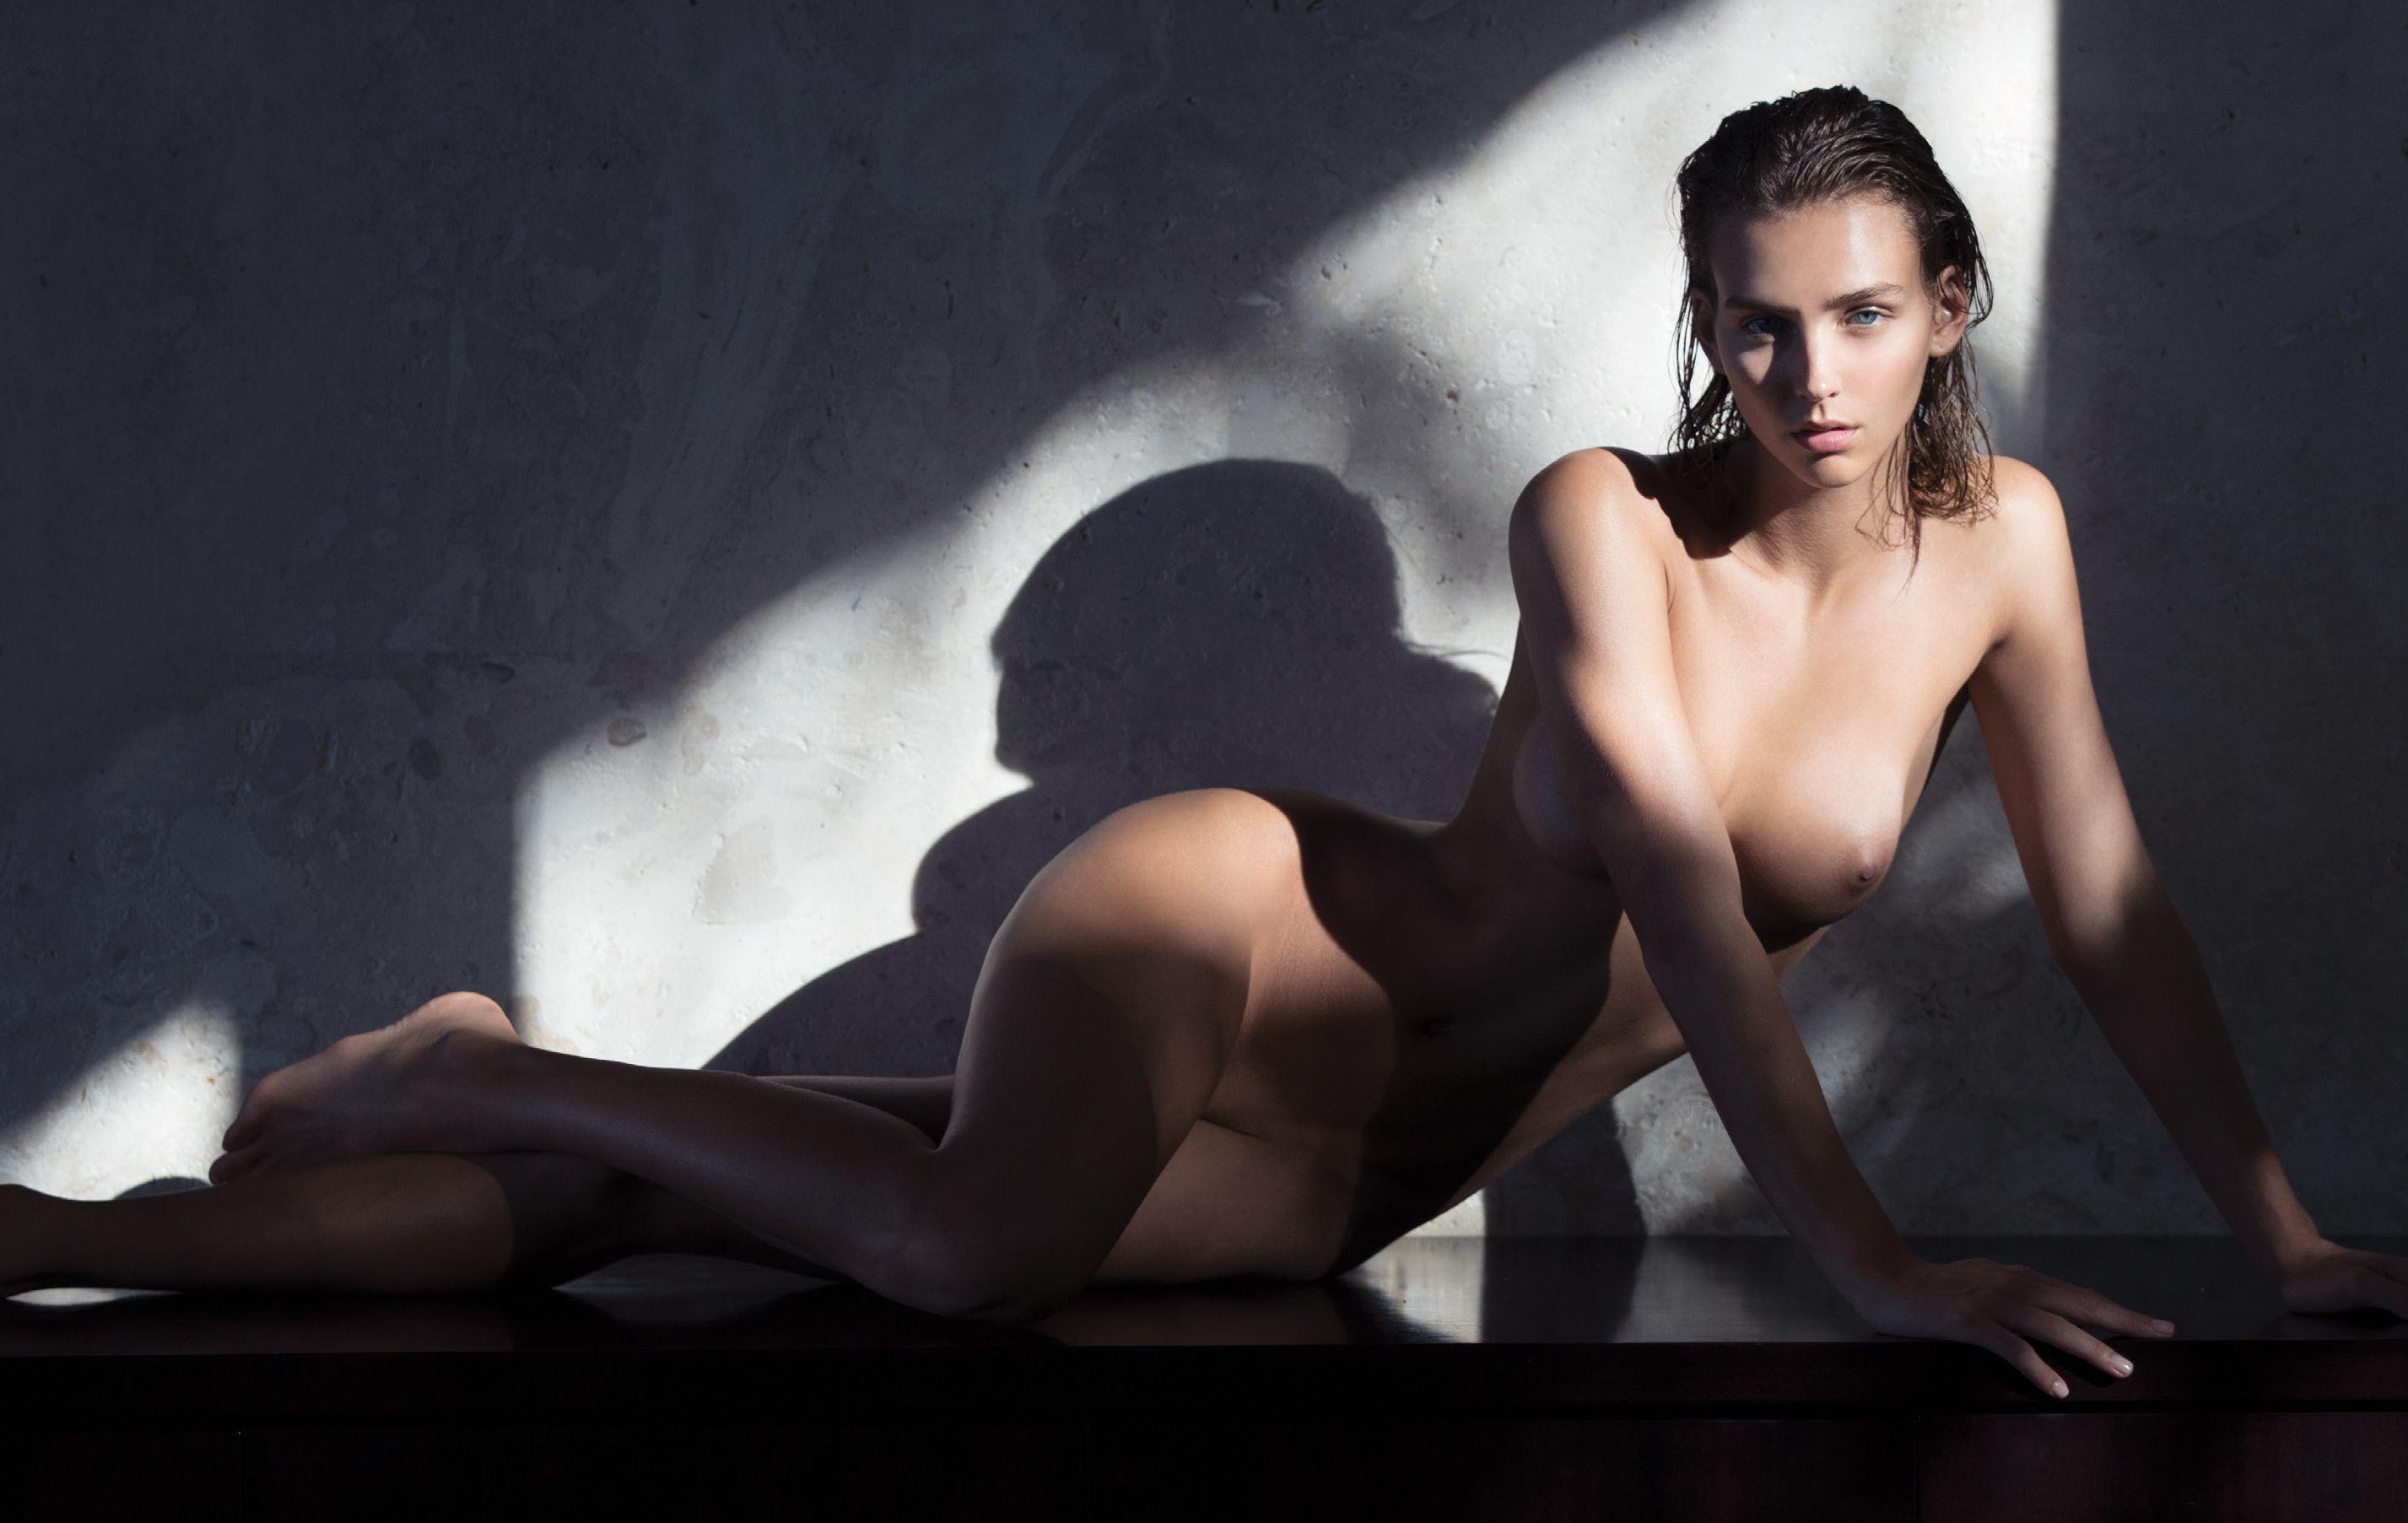 rachel naked